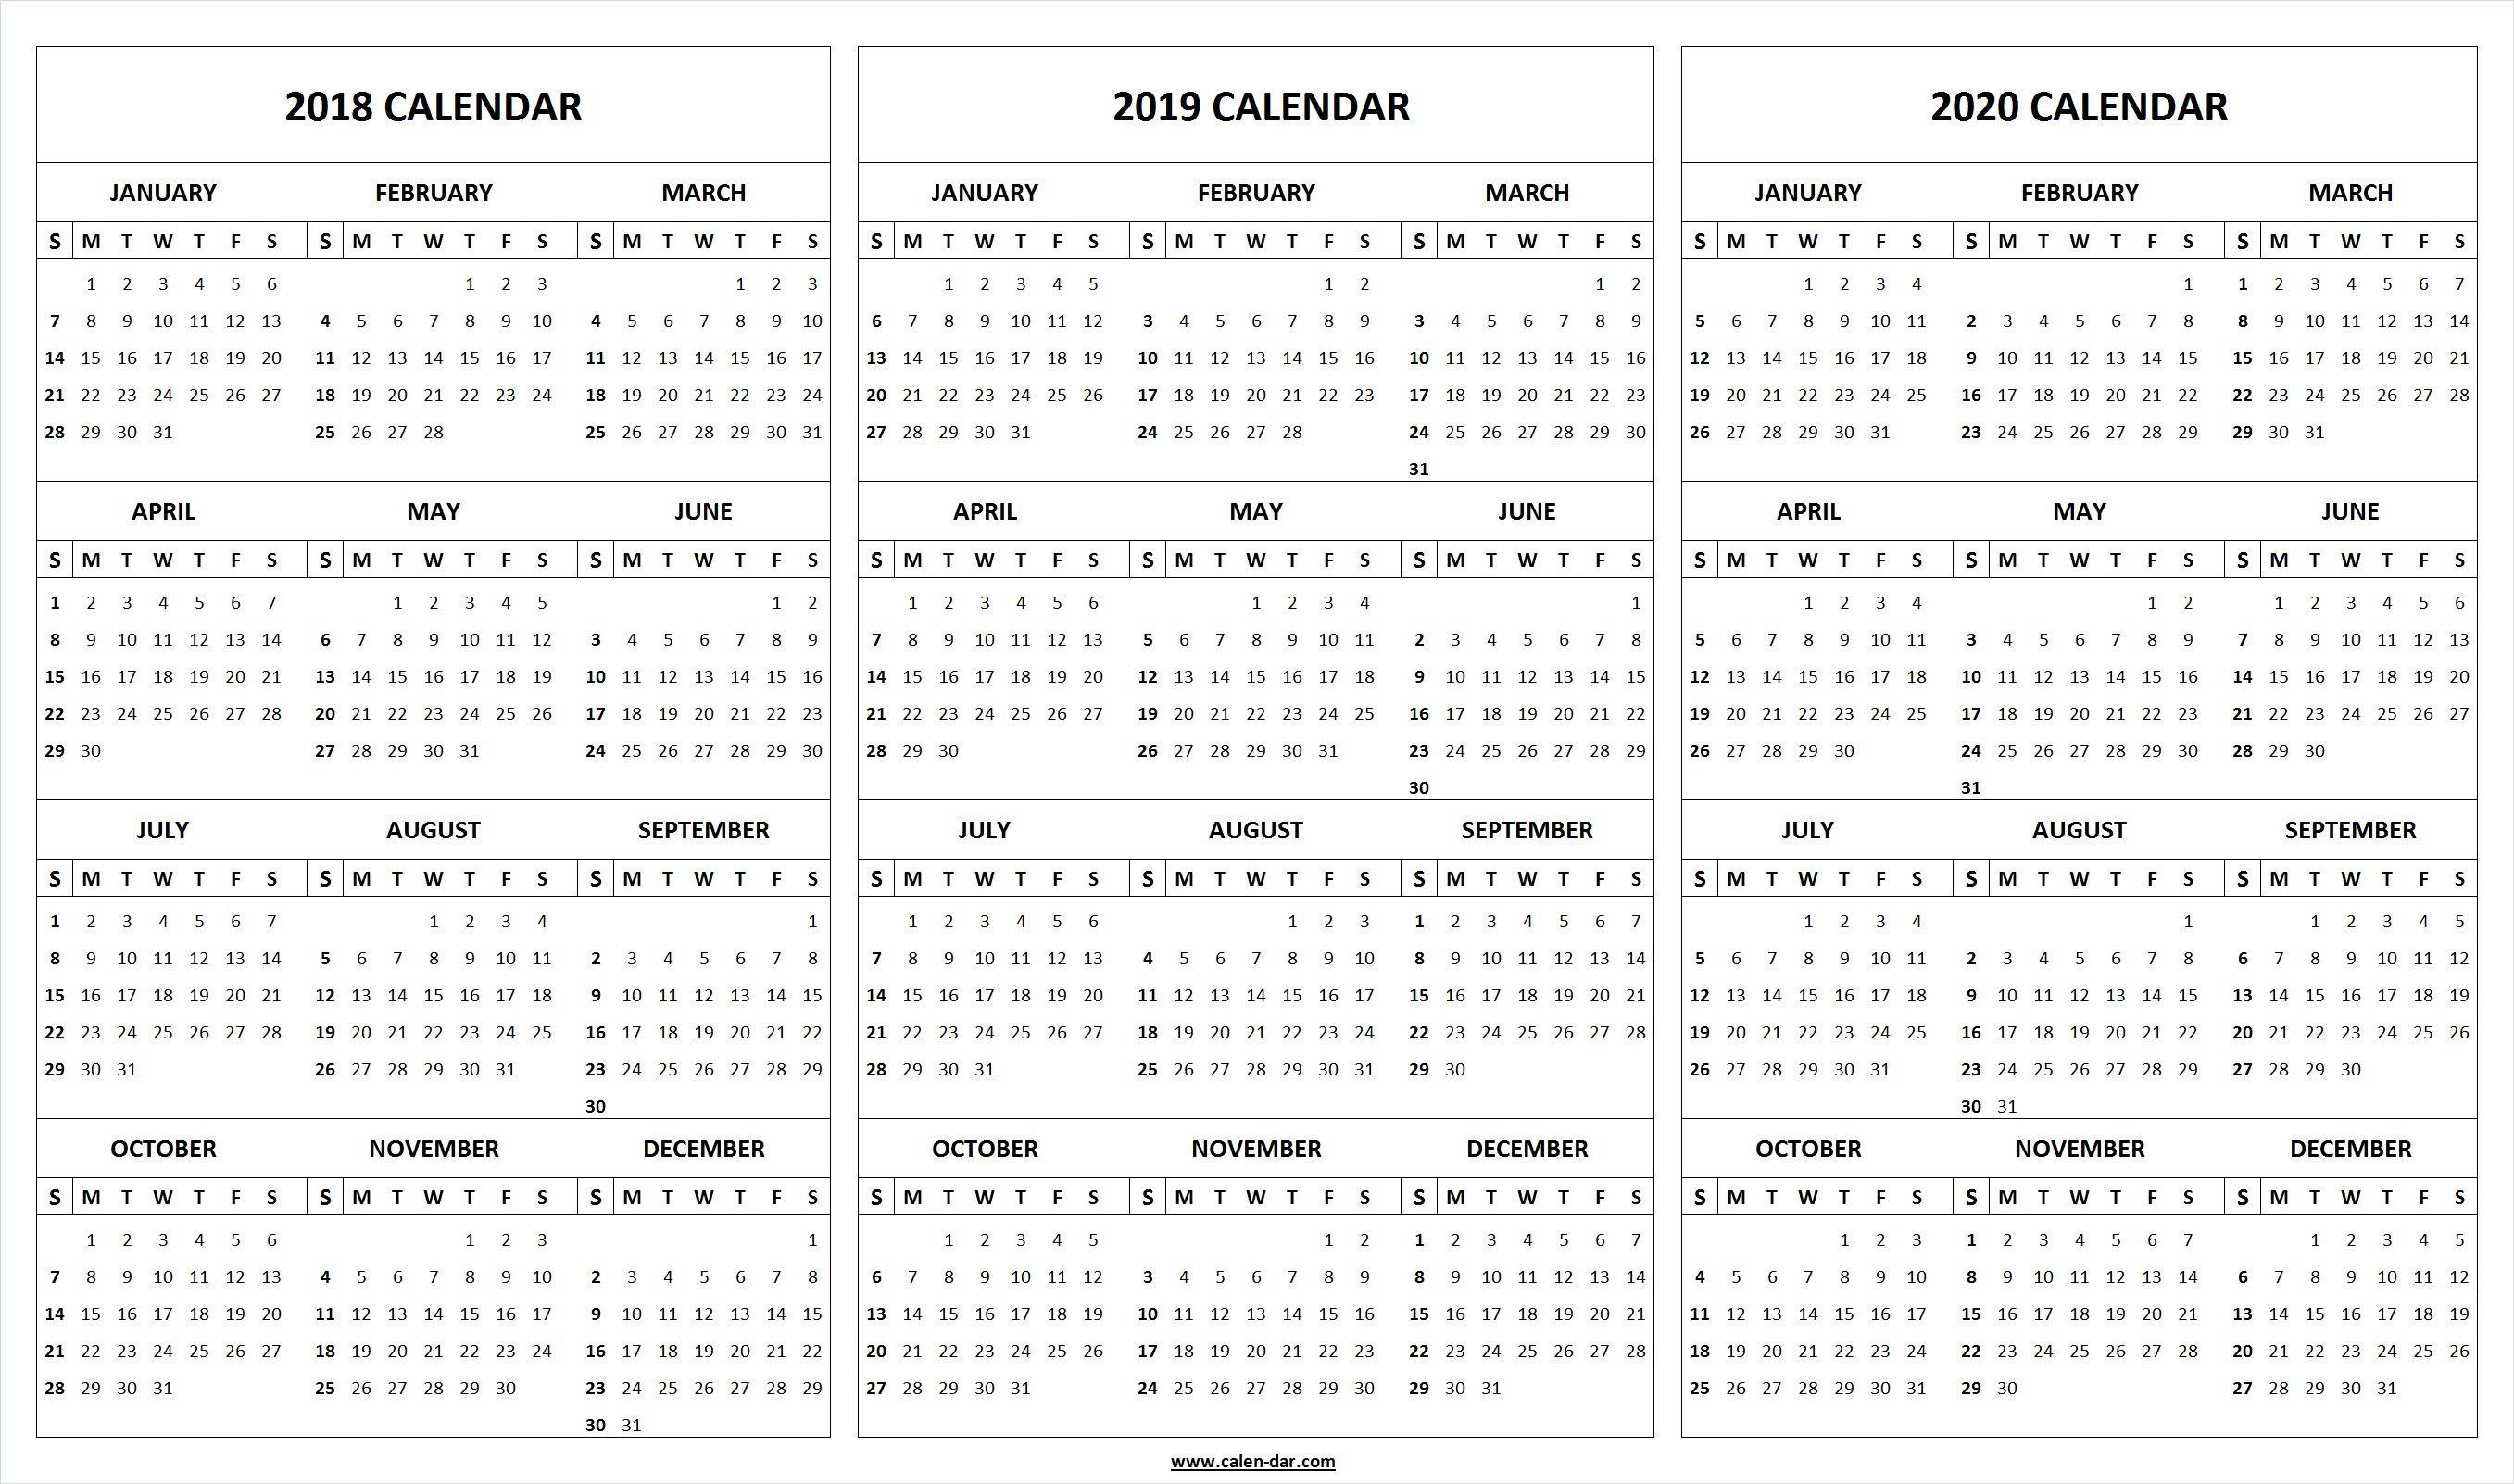 Print Blank 2018 2019 2020 Calendar Template | Organize! | 2019 regarding 2019 2020 Ms Word Calendar